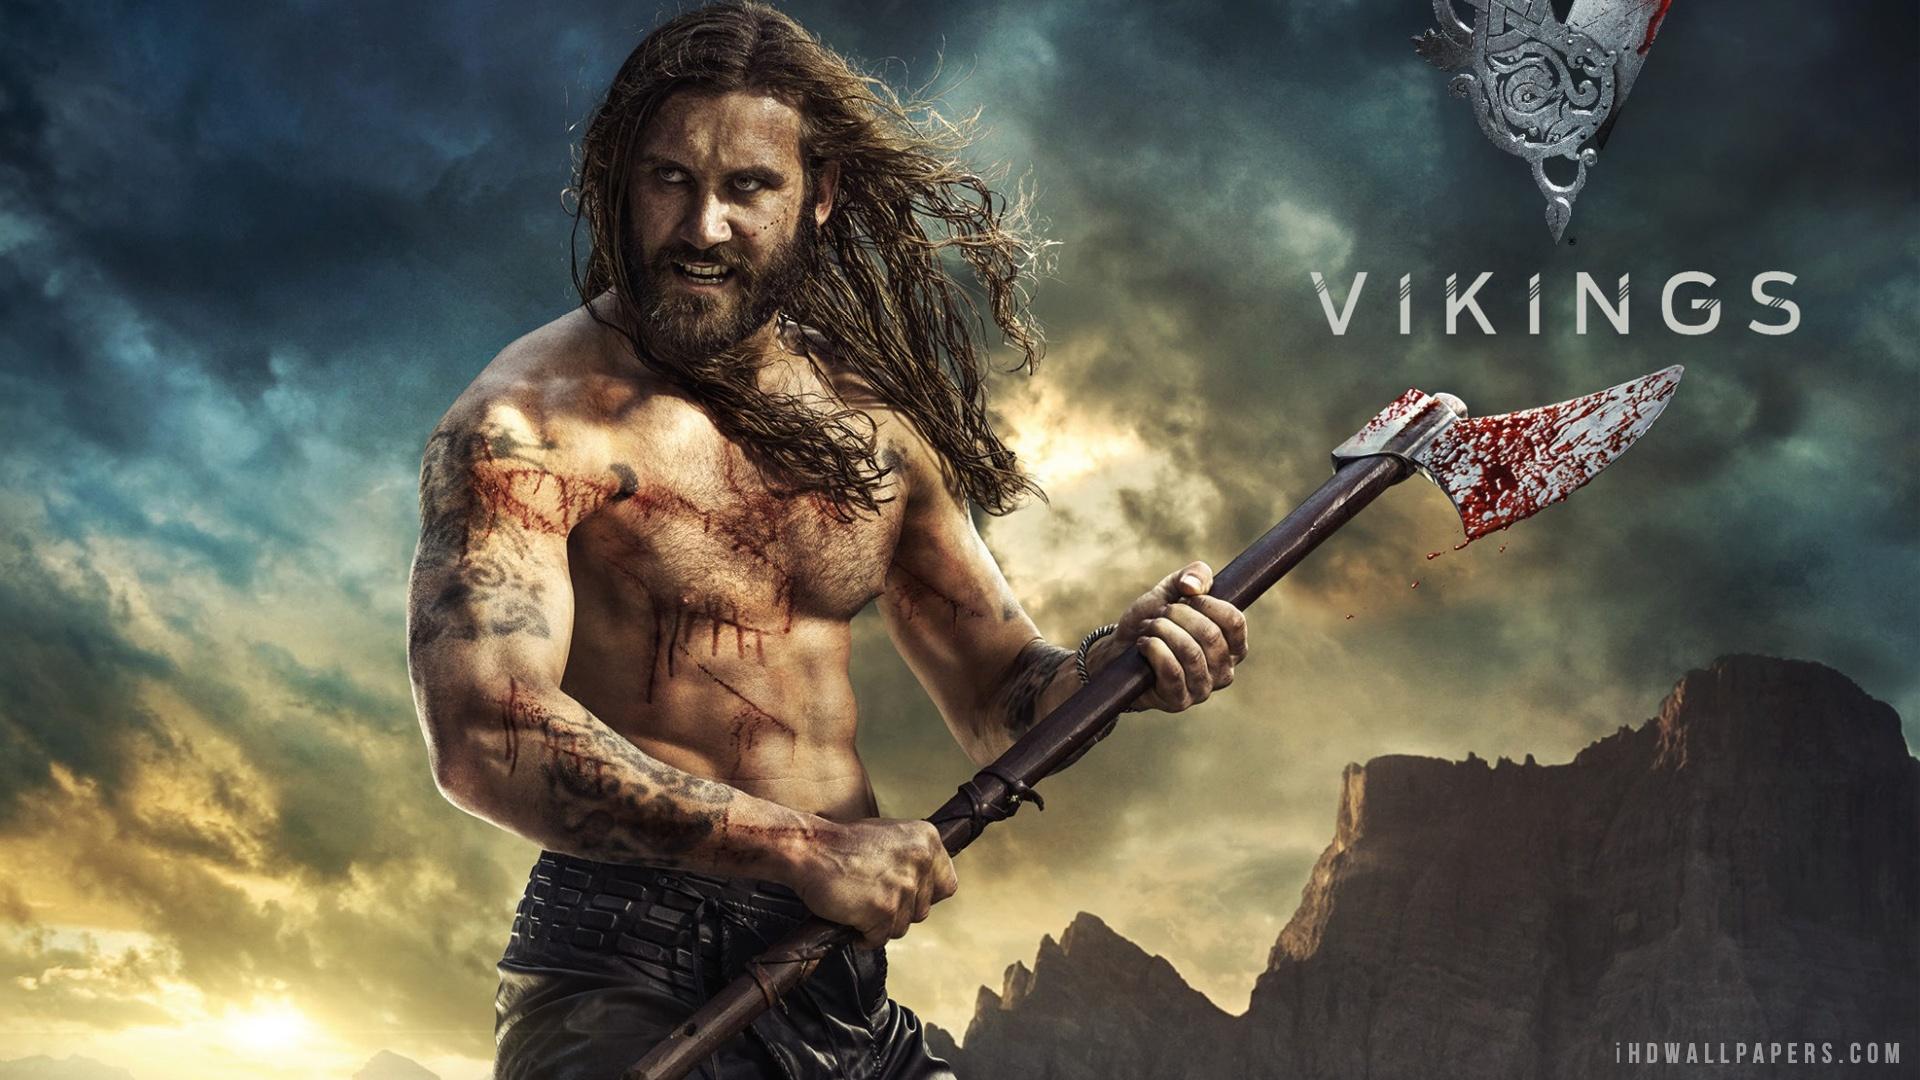 Rollo Vikings Season 2 TV Series 2014 HD Wallpaper   iHD Wallpapers 1920x1080